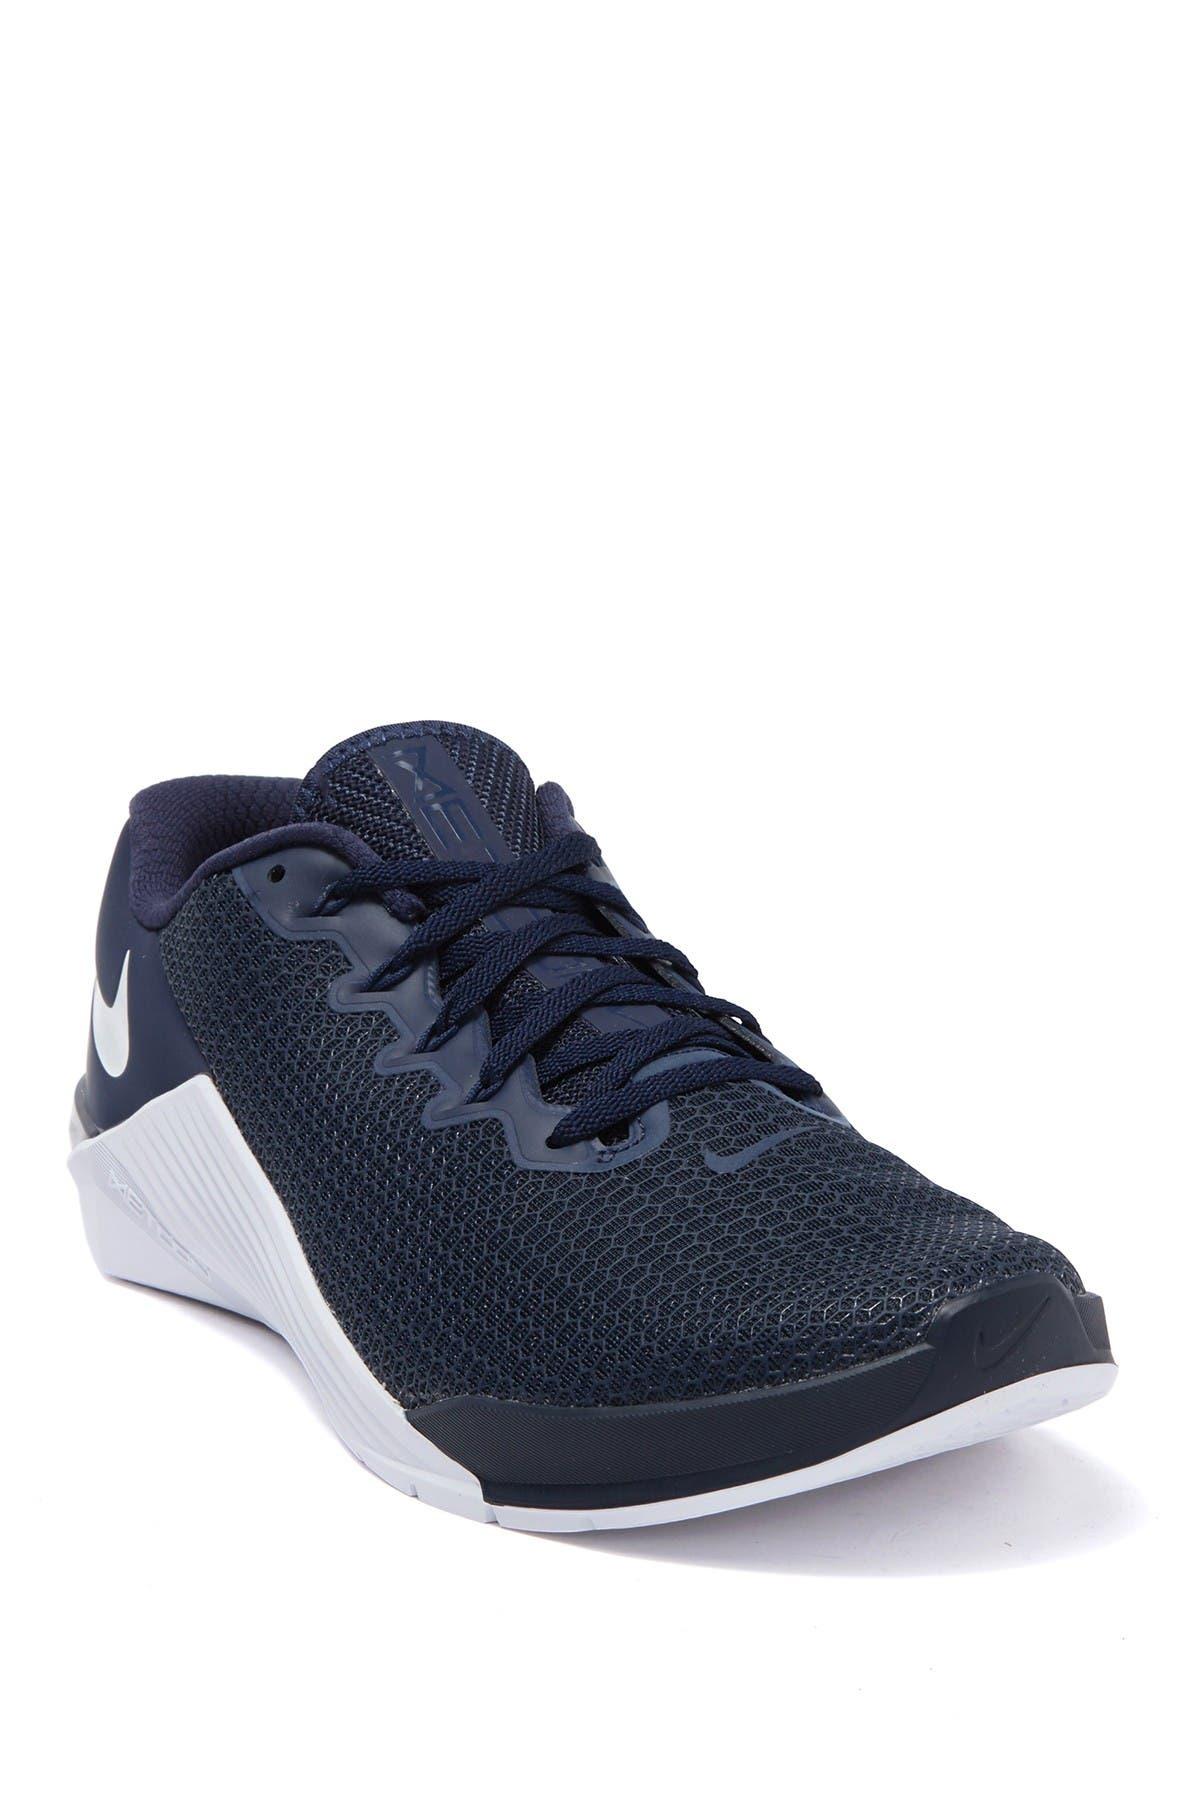 Nike   Metcon 5 Sneaker   Nordstrom Rack